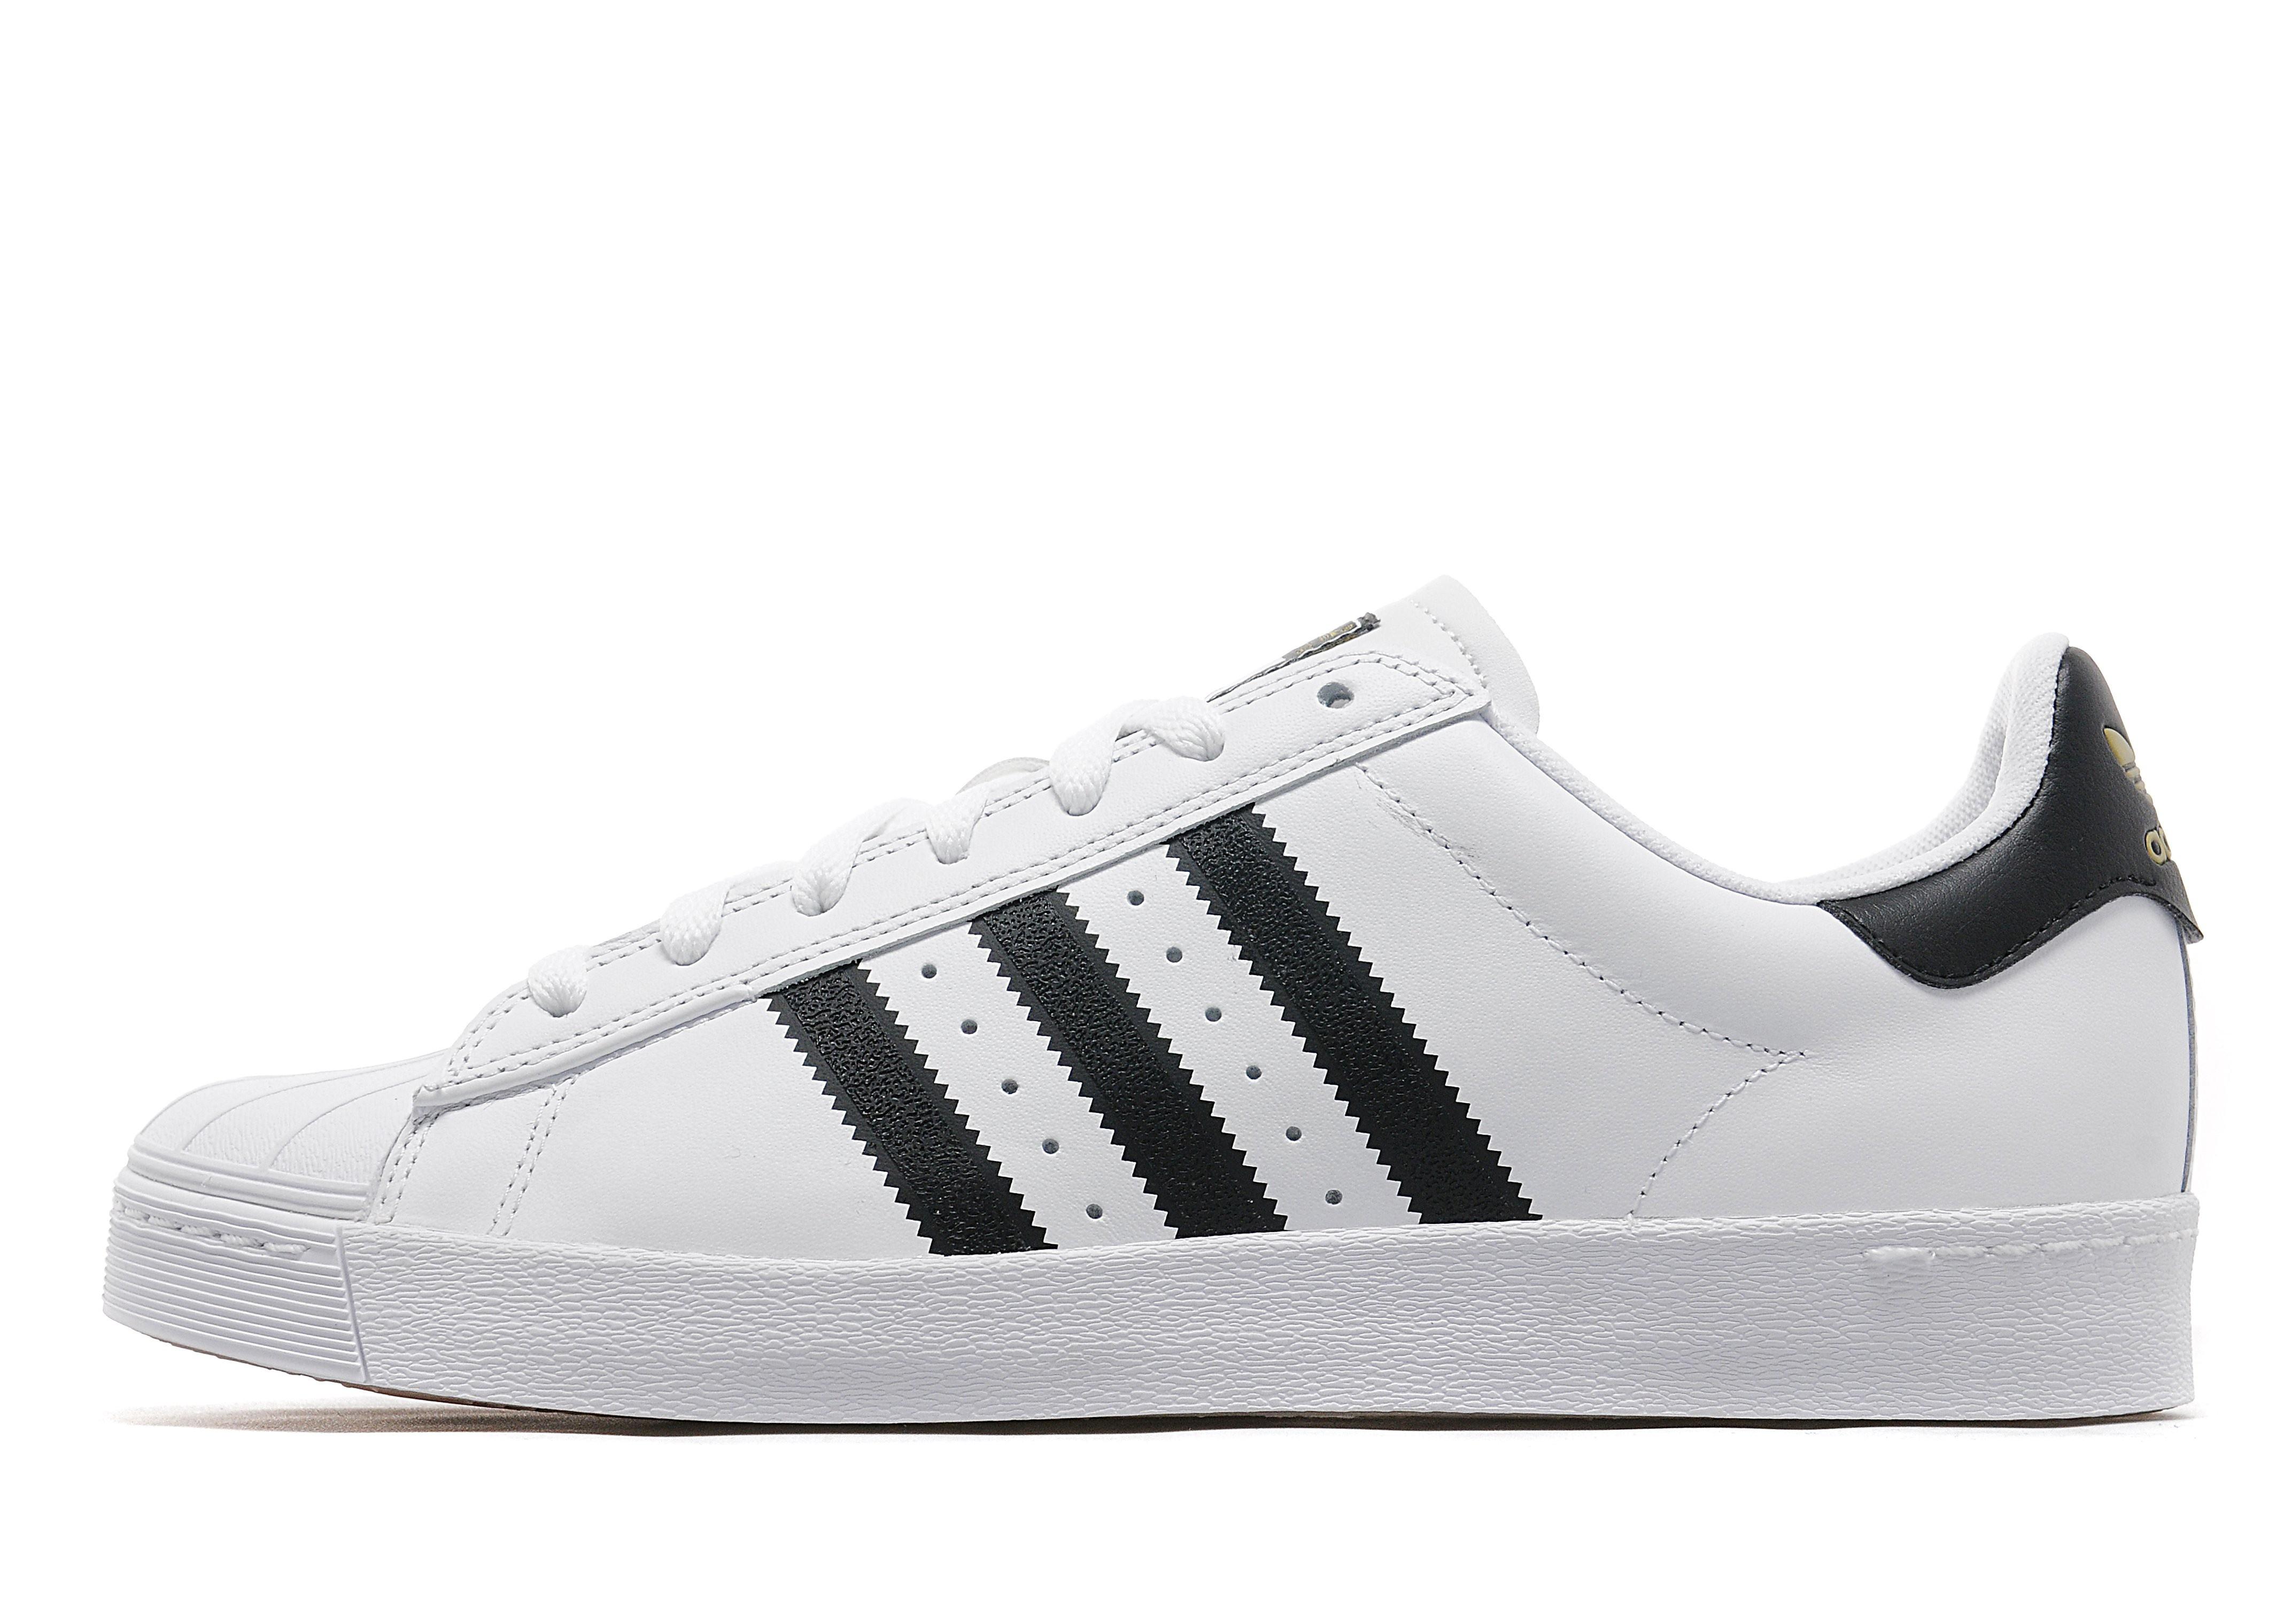 adidas Originals Superstar Vulc ADV